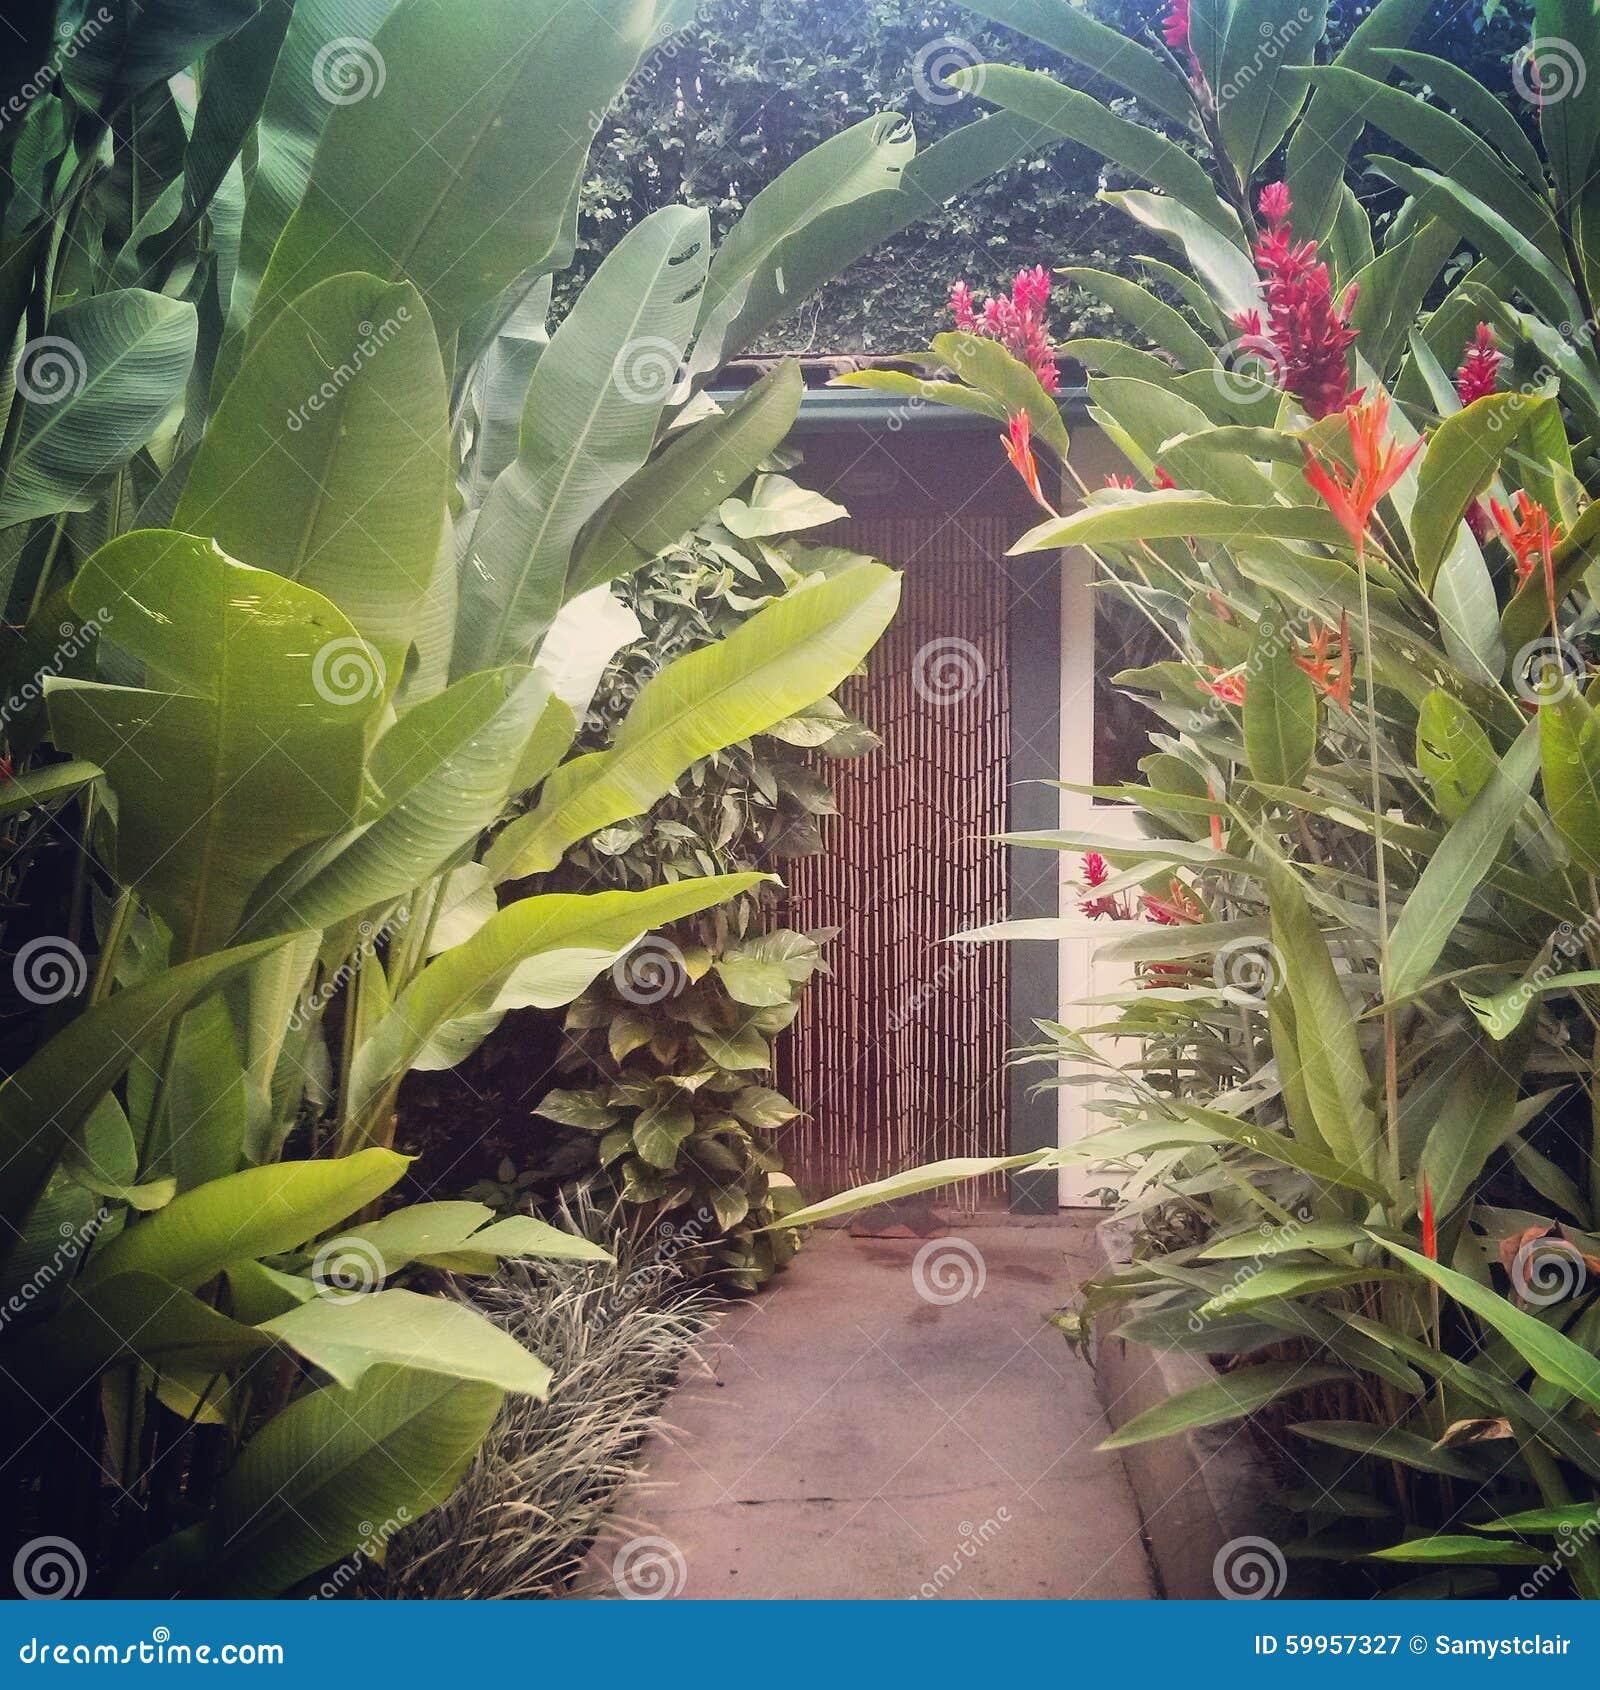 Tropical Garden Walkway And Beaded Curtain Entrance Stock Photo ...